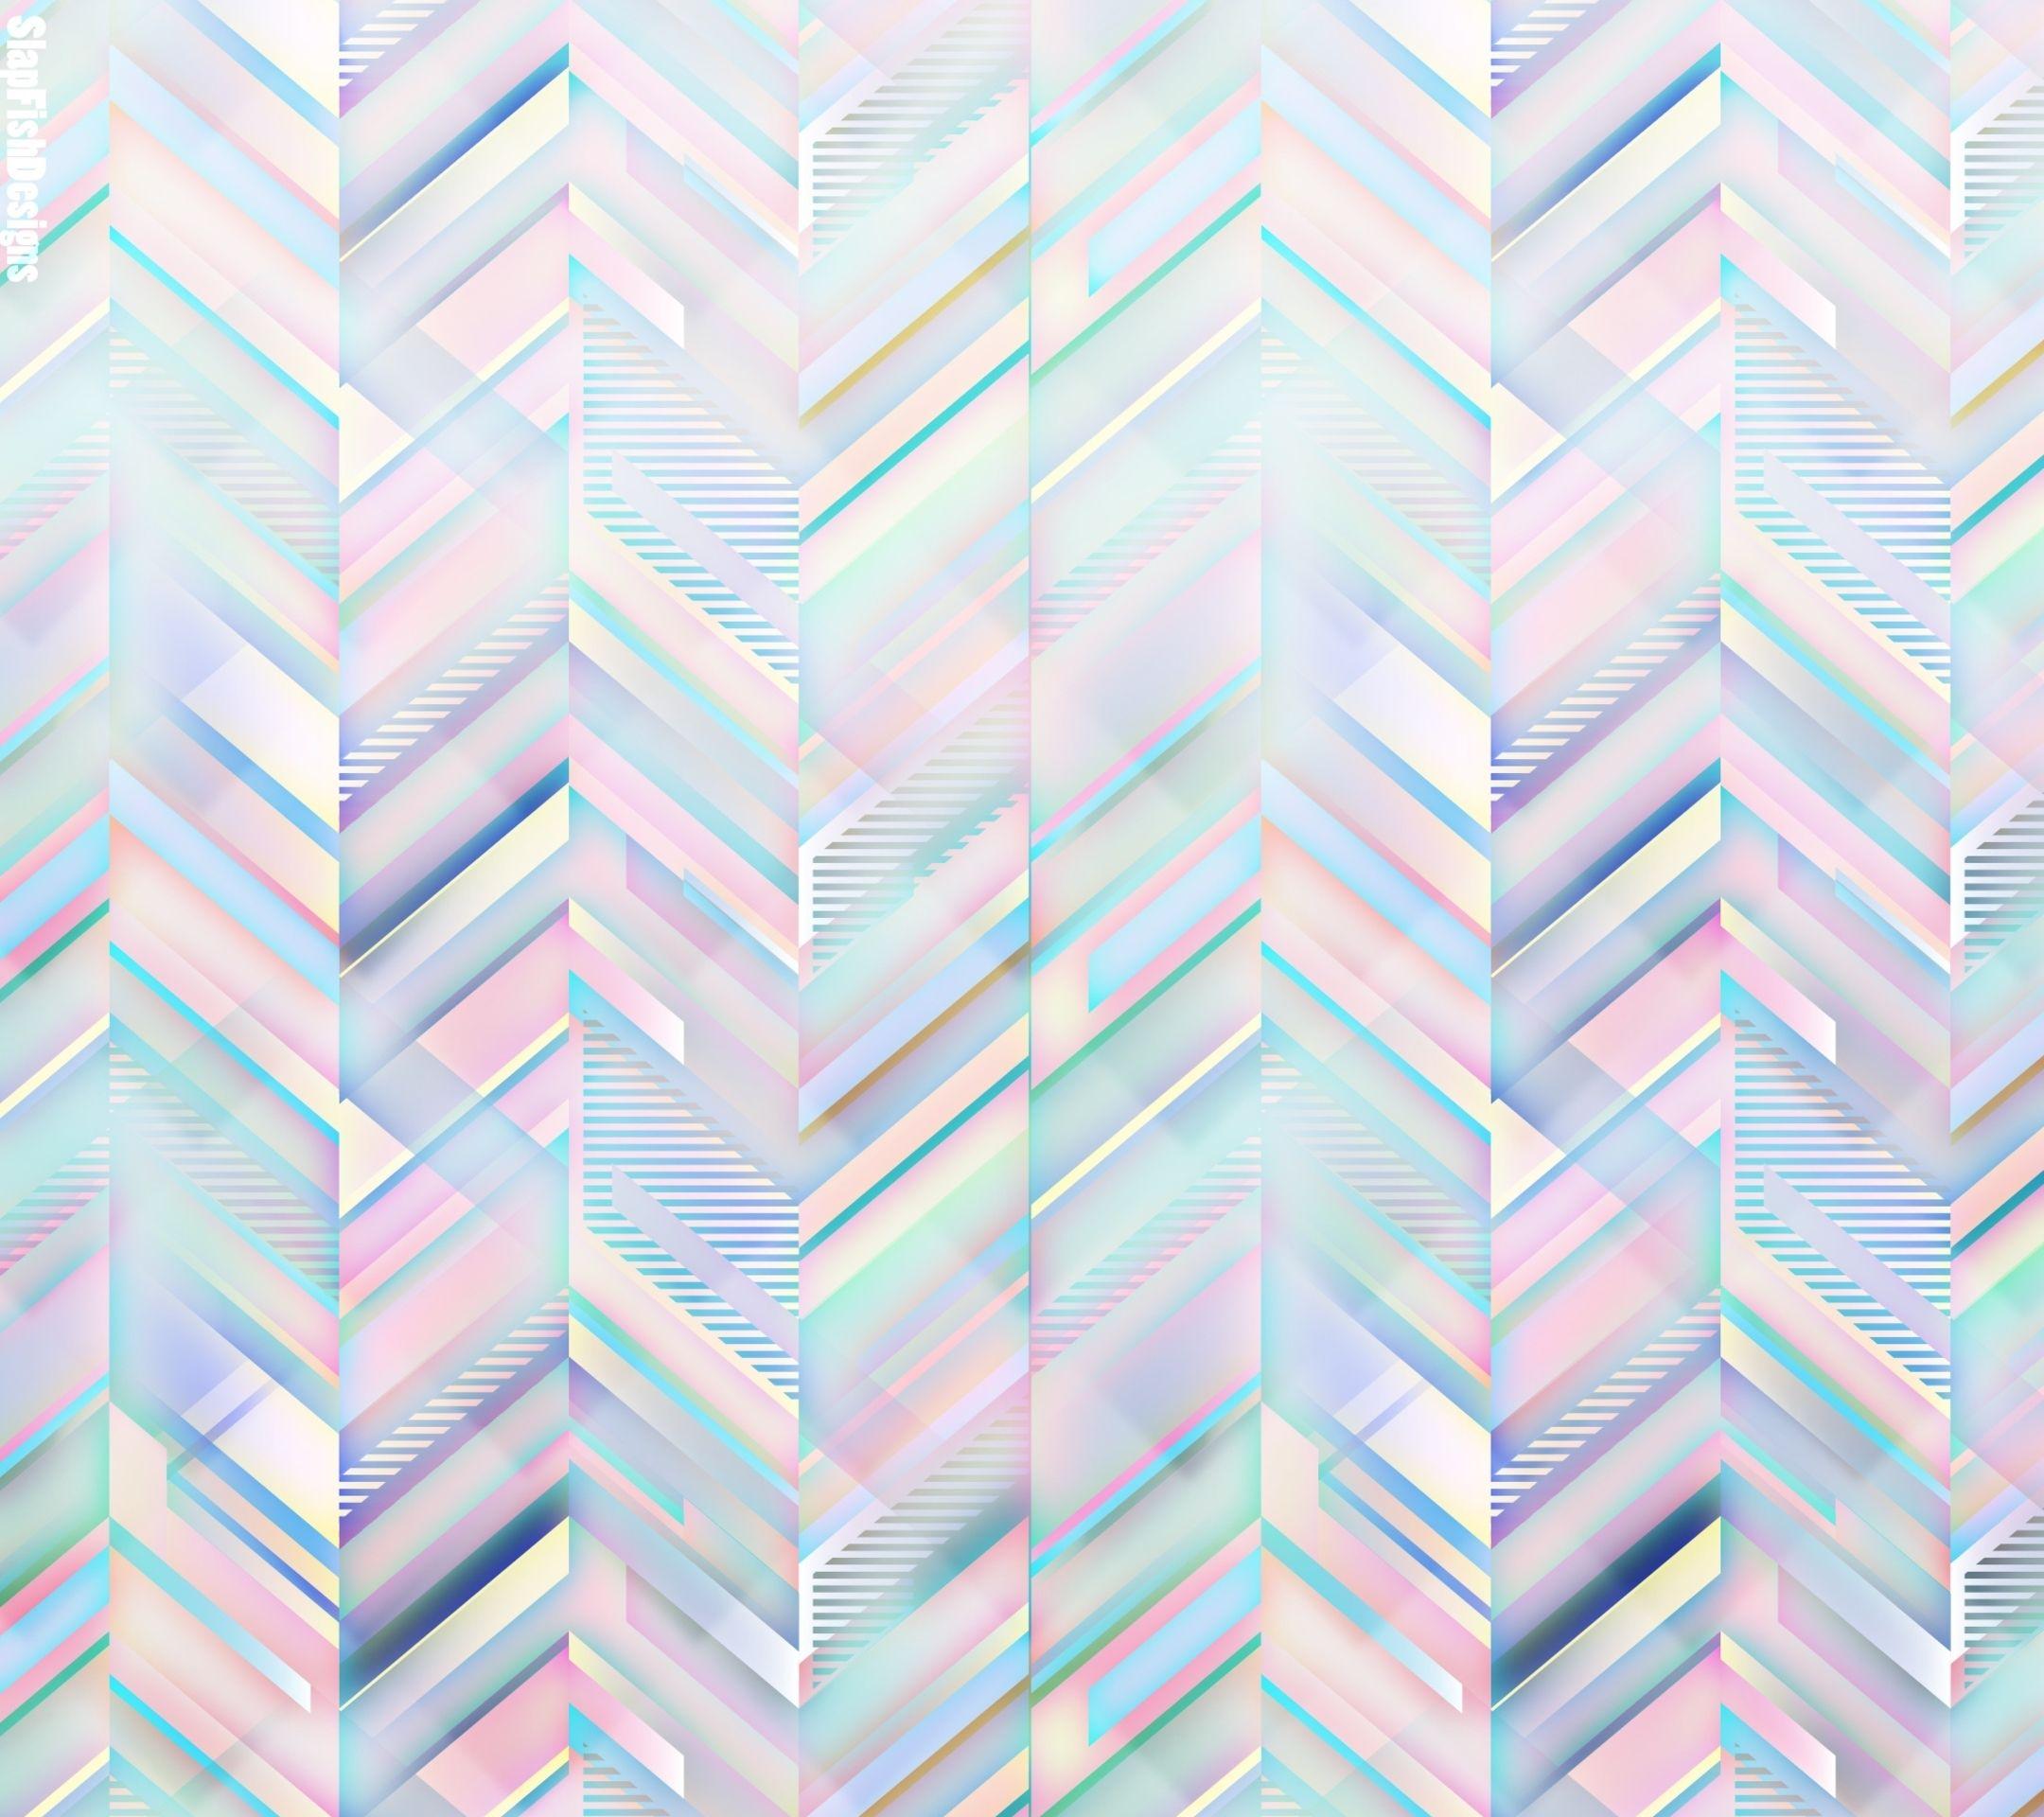 wallpaper tumblr patterns pattern wallpapers tumblr wallpaper hd patterns 79